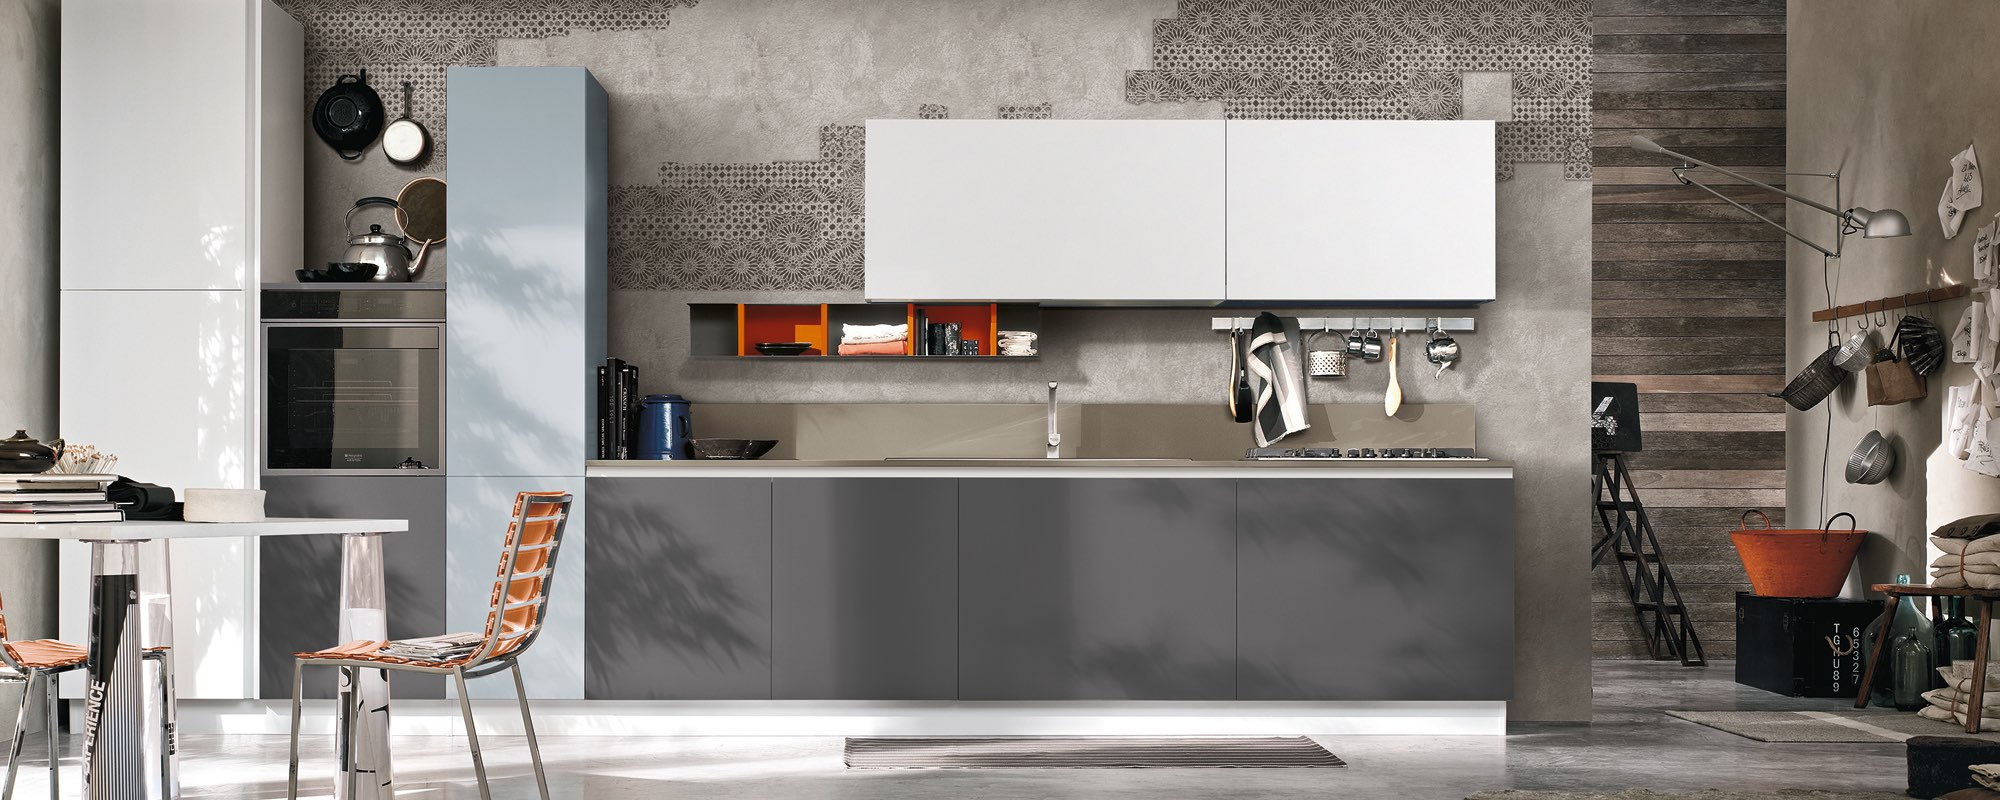 cucina componibile moderna con frigorifero e arredamento